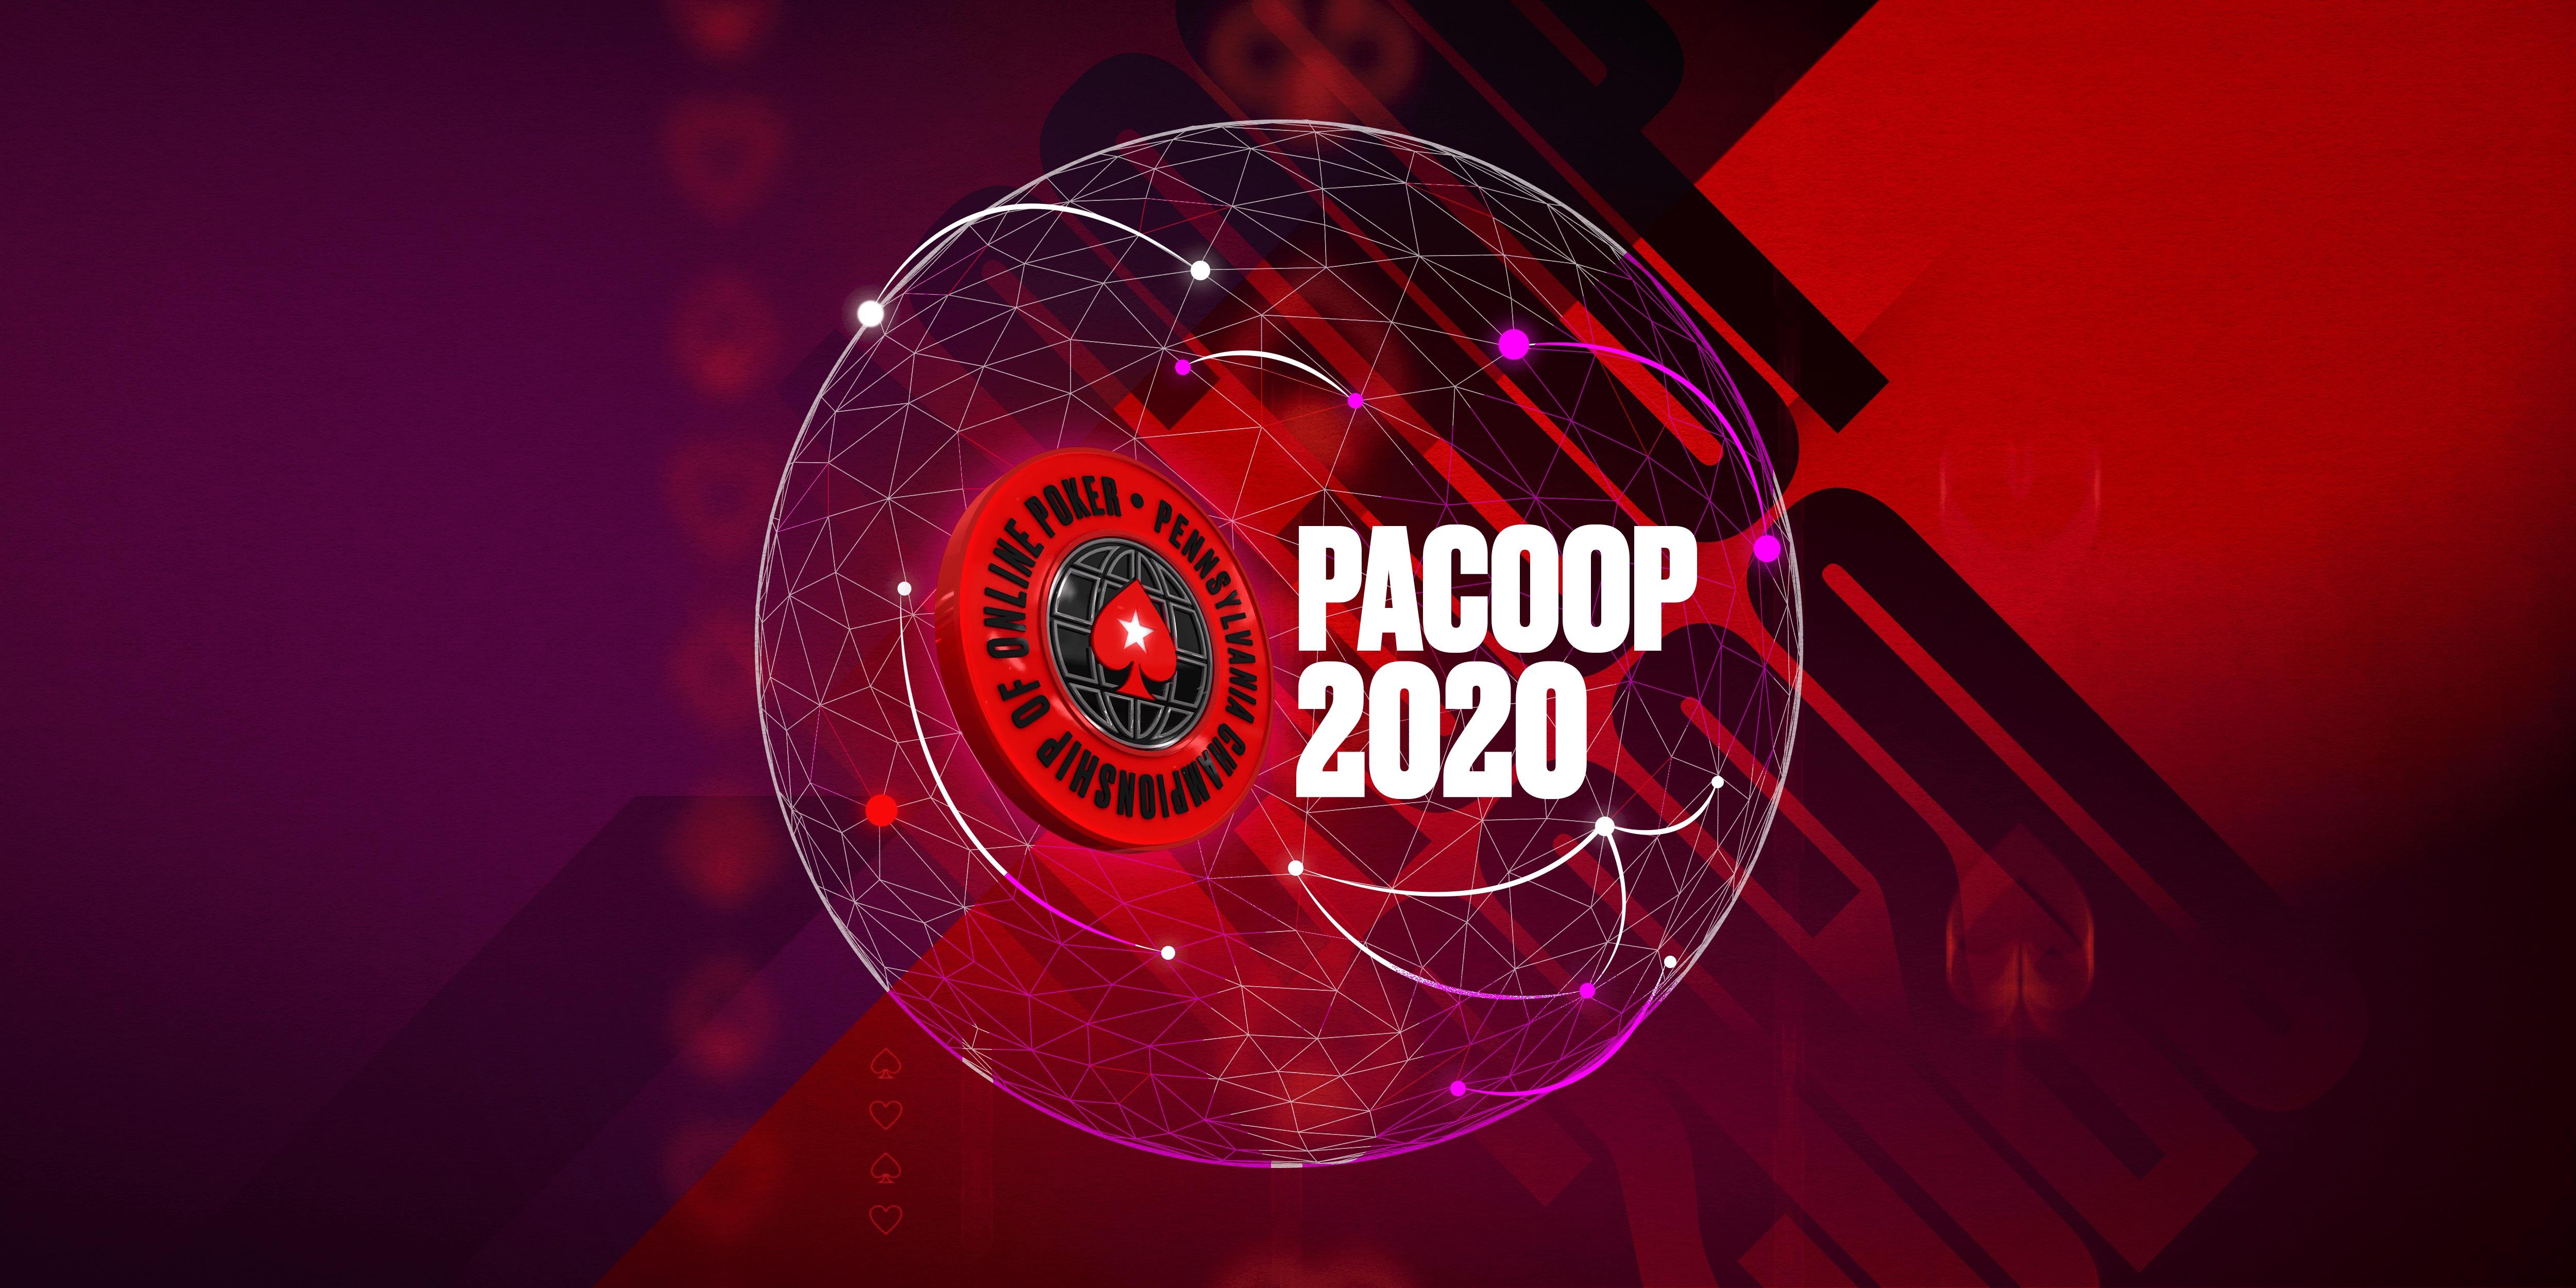 PokerStars PACOOP 2020